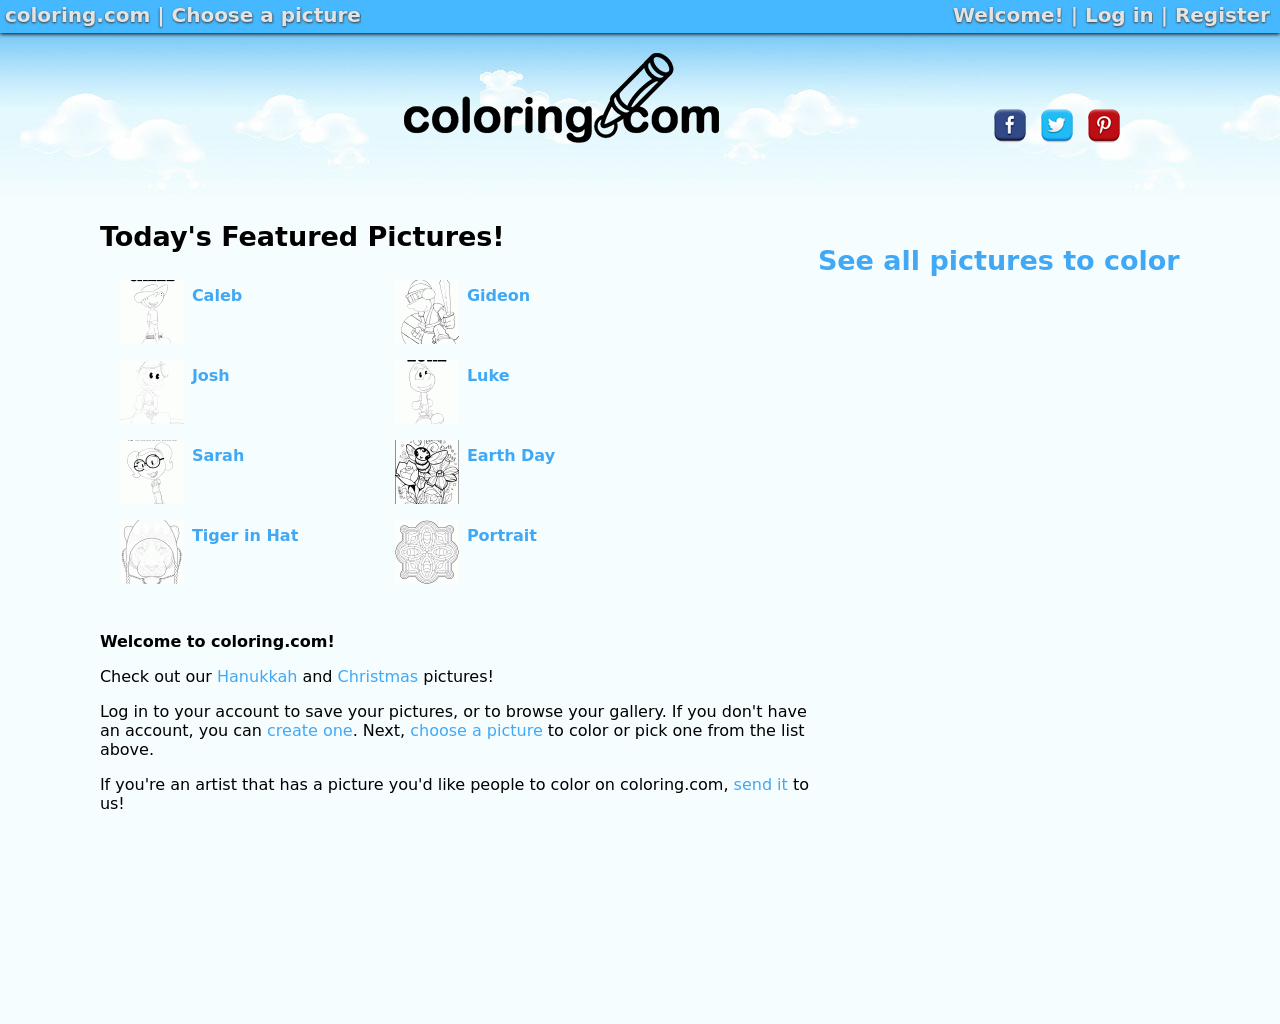 Coloring.com-Advertising-Reviews-Pricing